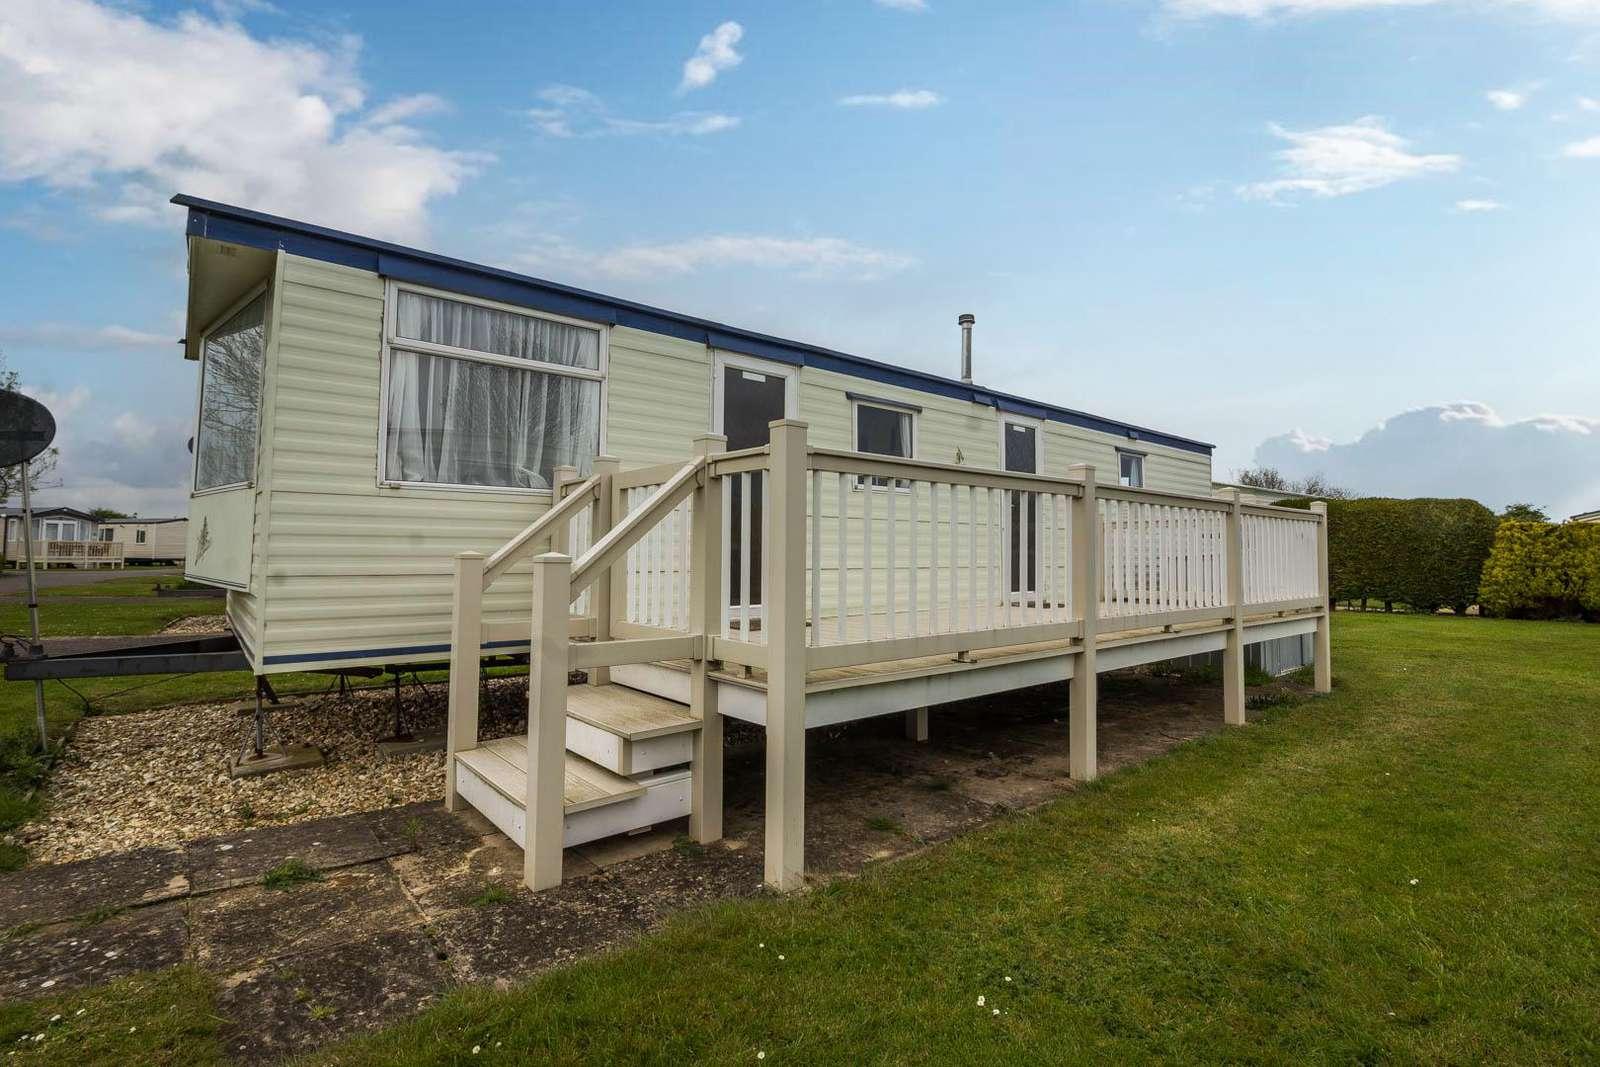 66243S – Sandhills area, 3 bed, 8 berth caravan with panel heating. Emerald rated. - property